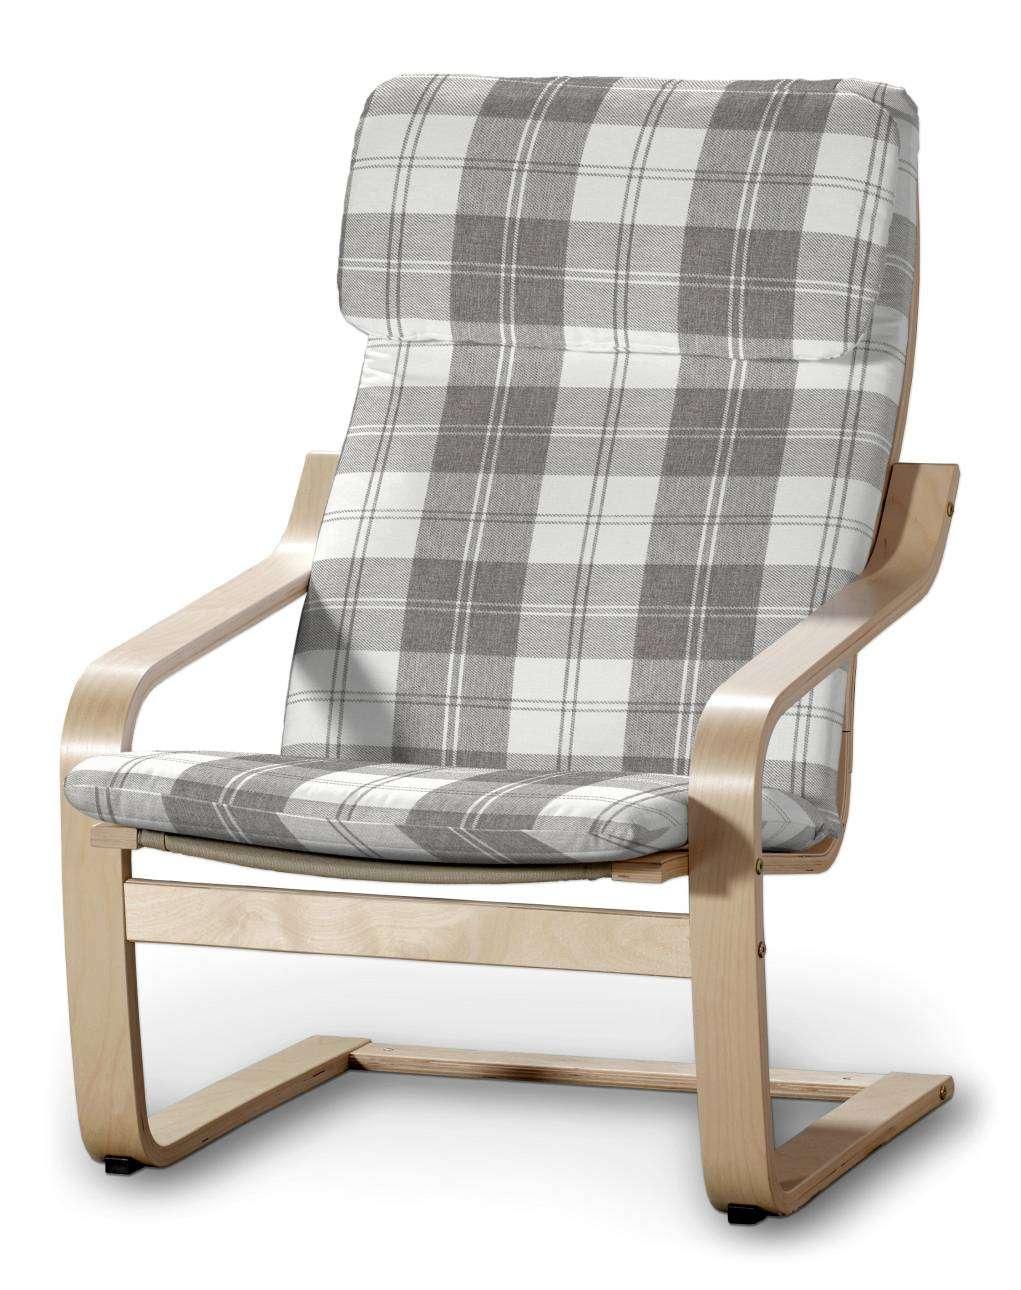 Poduszka na fotel Poäng w kolekcji Edinburgh, tkanina: 115-79